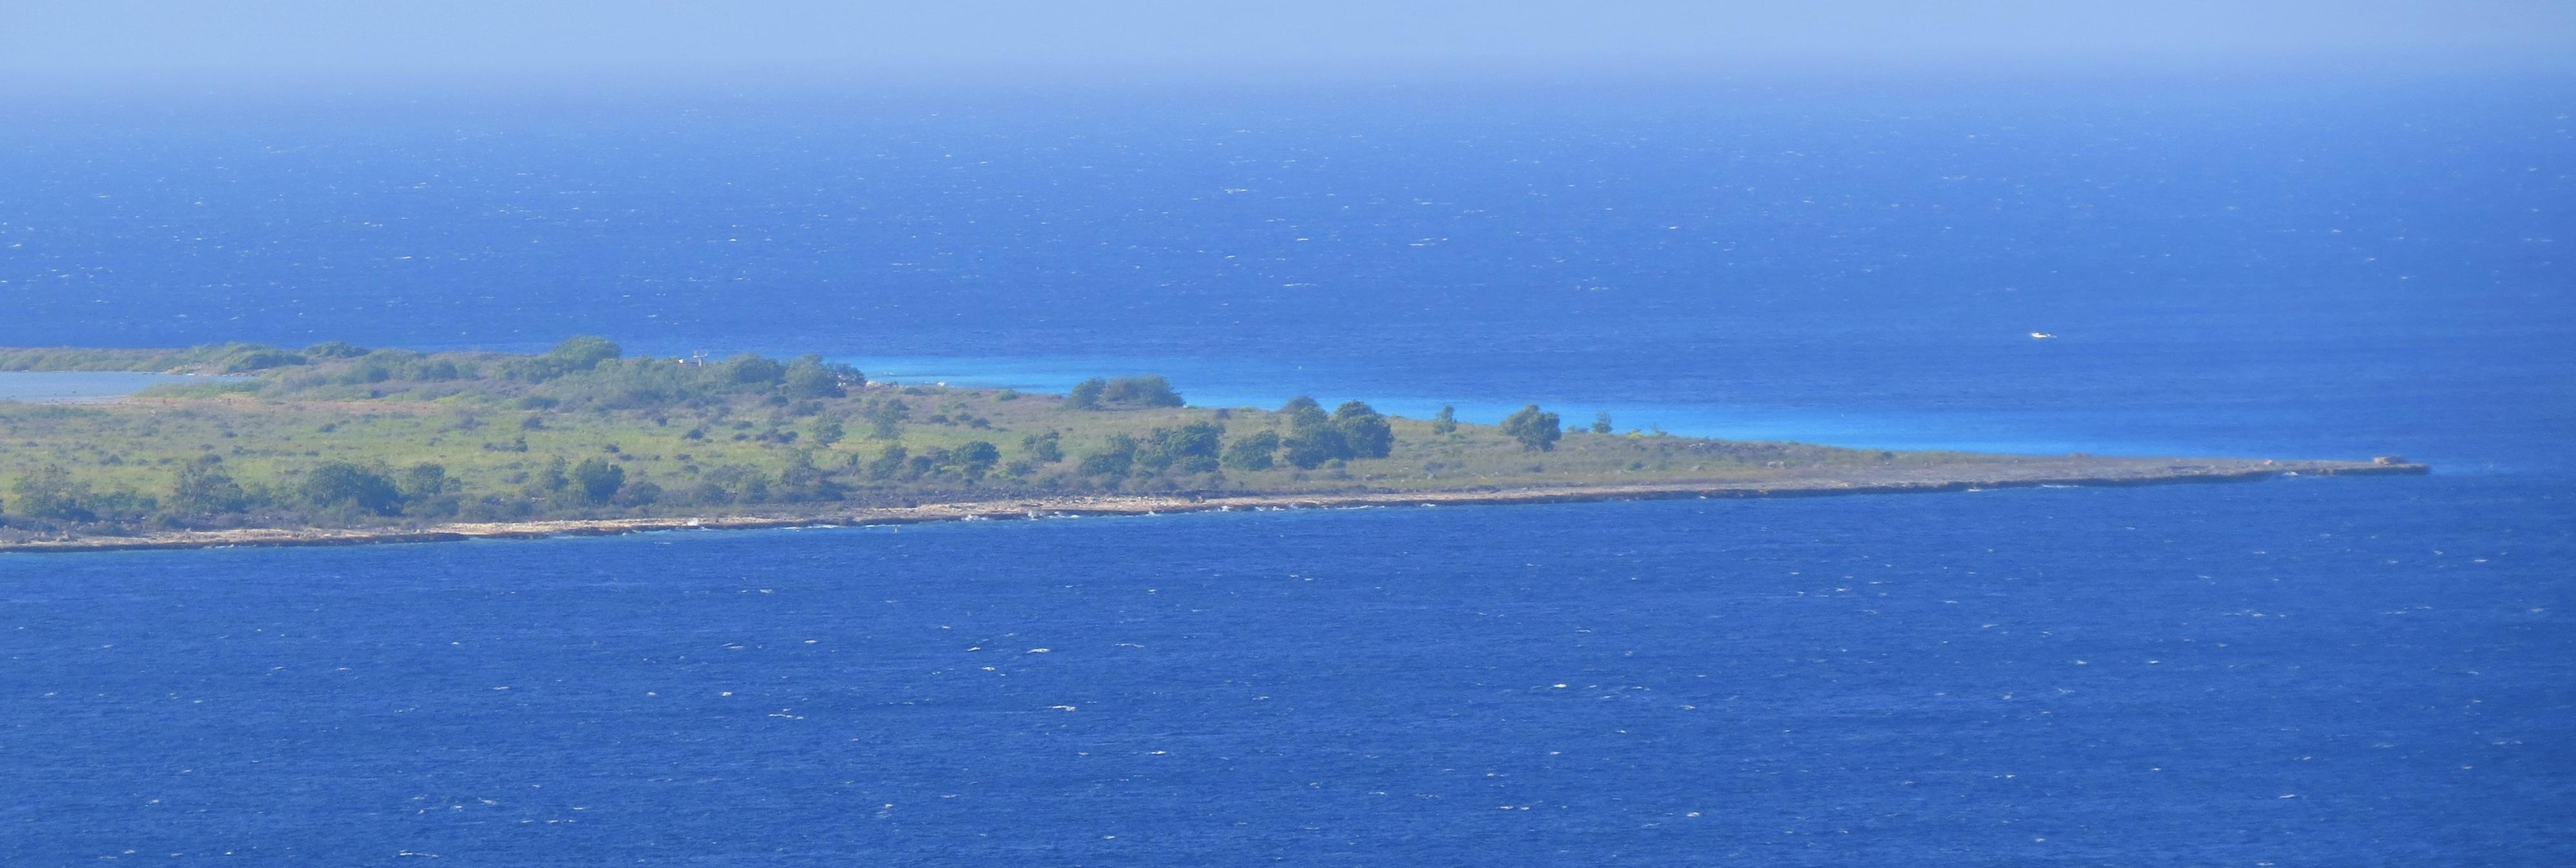 Amazing views of the turquoise water around Klein Bonaire